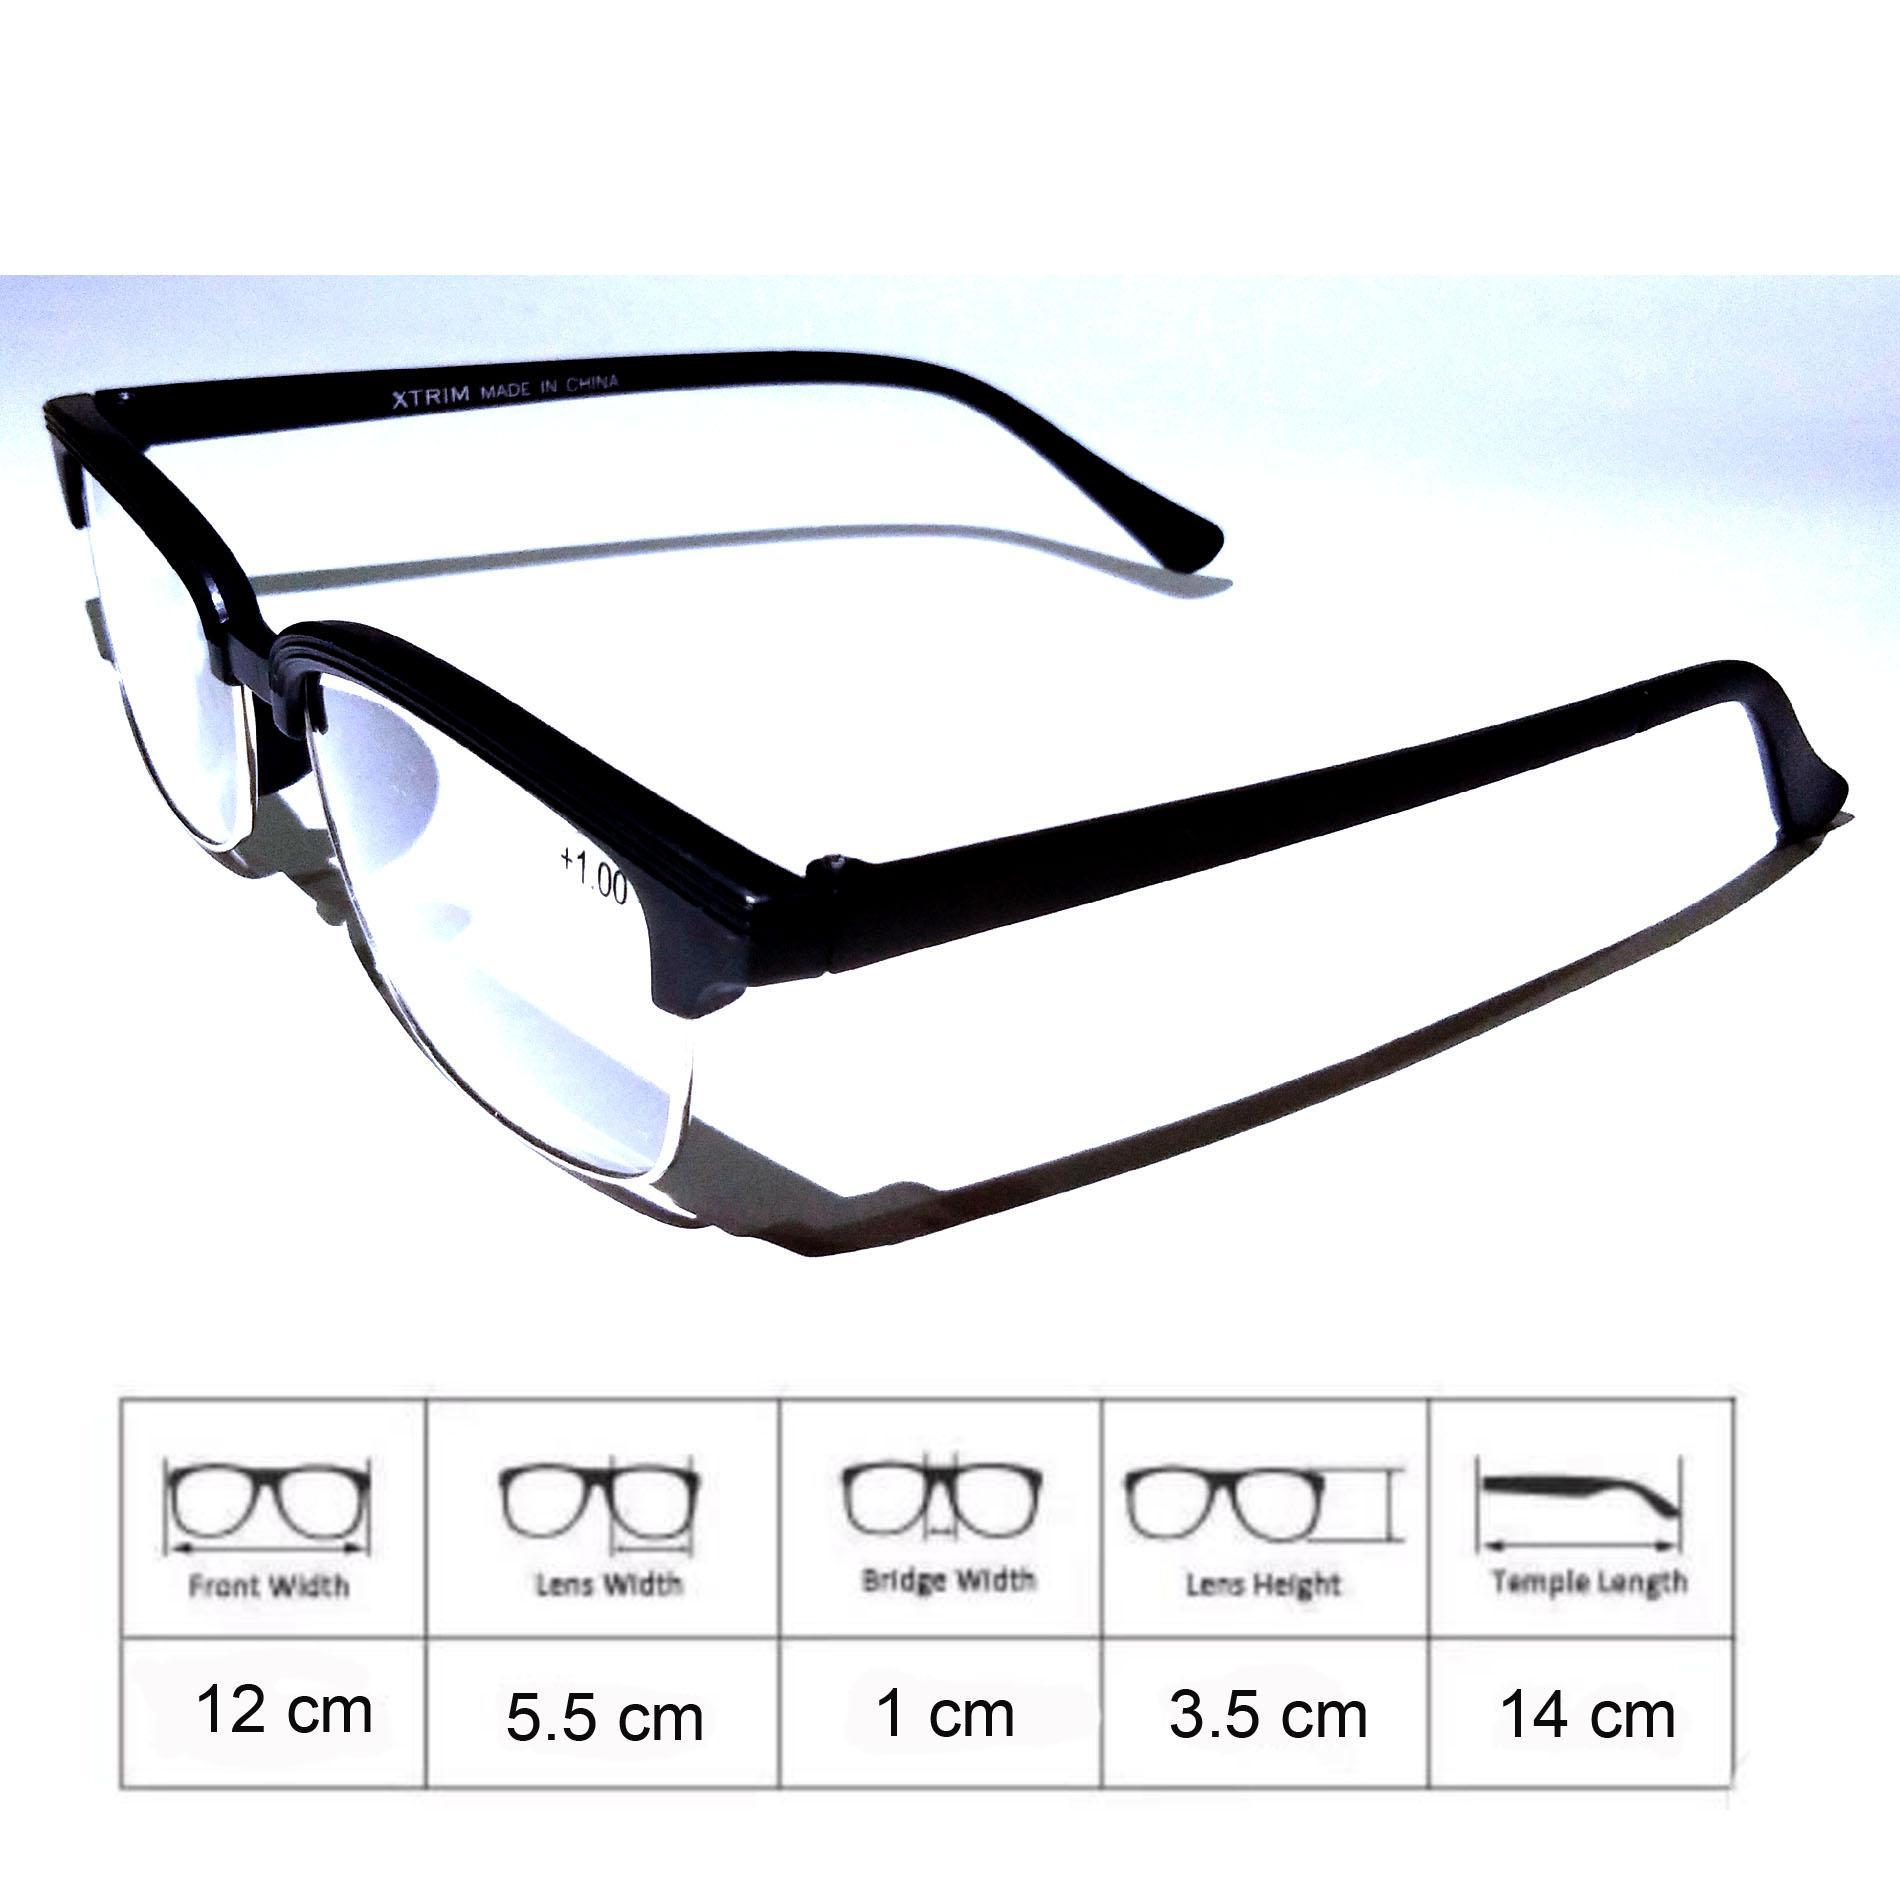 RAKA eyewear - Kacamata Baca Plus (+) Korean Style Kacamata Baca Fashion  untuk Pria 8f8c611125